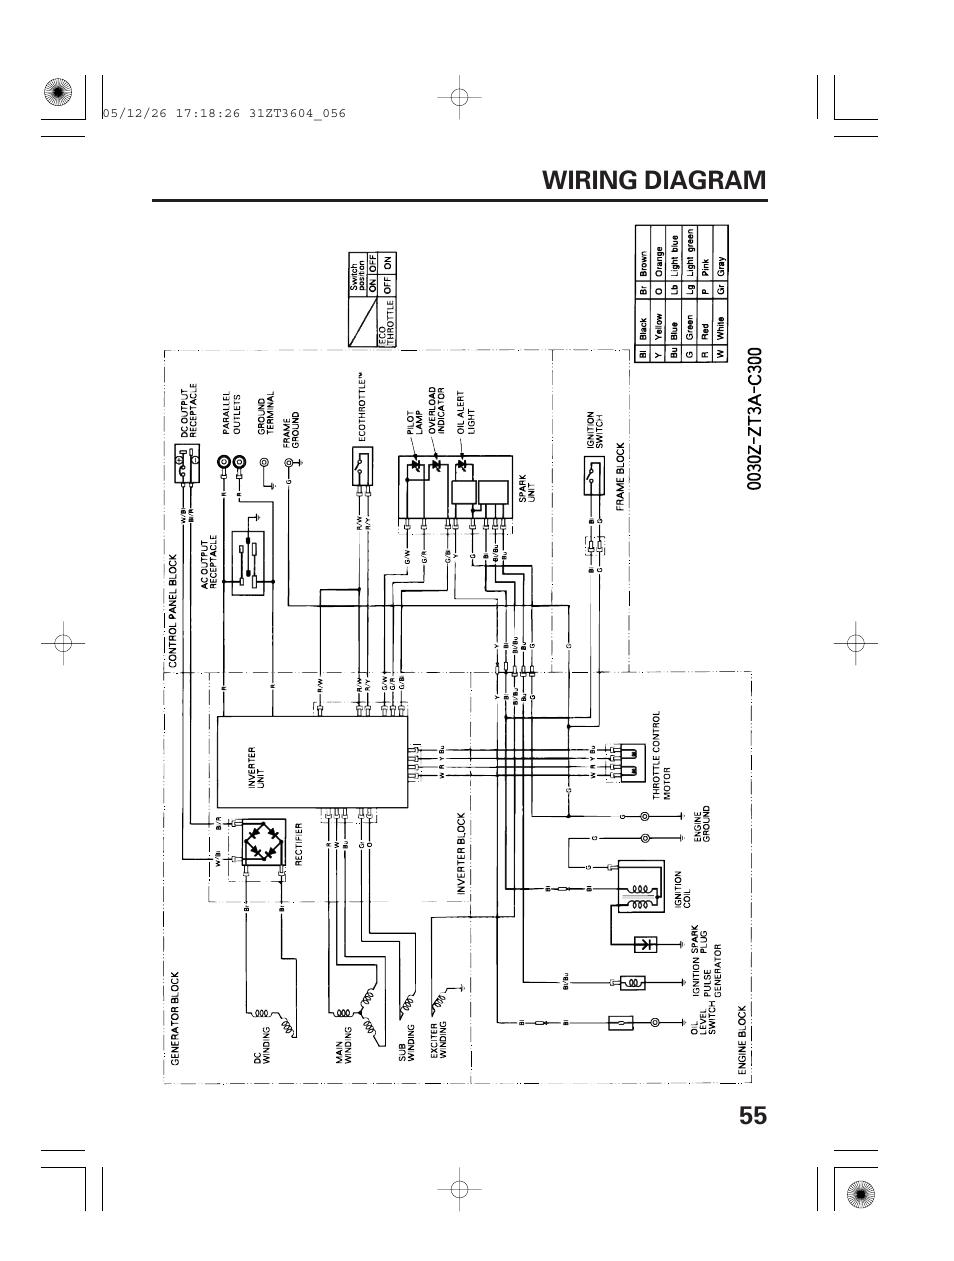 Wiring diagram, 55 wiring diagram | HONDA EU1000i User Manual | Page 57 / 71